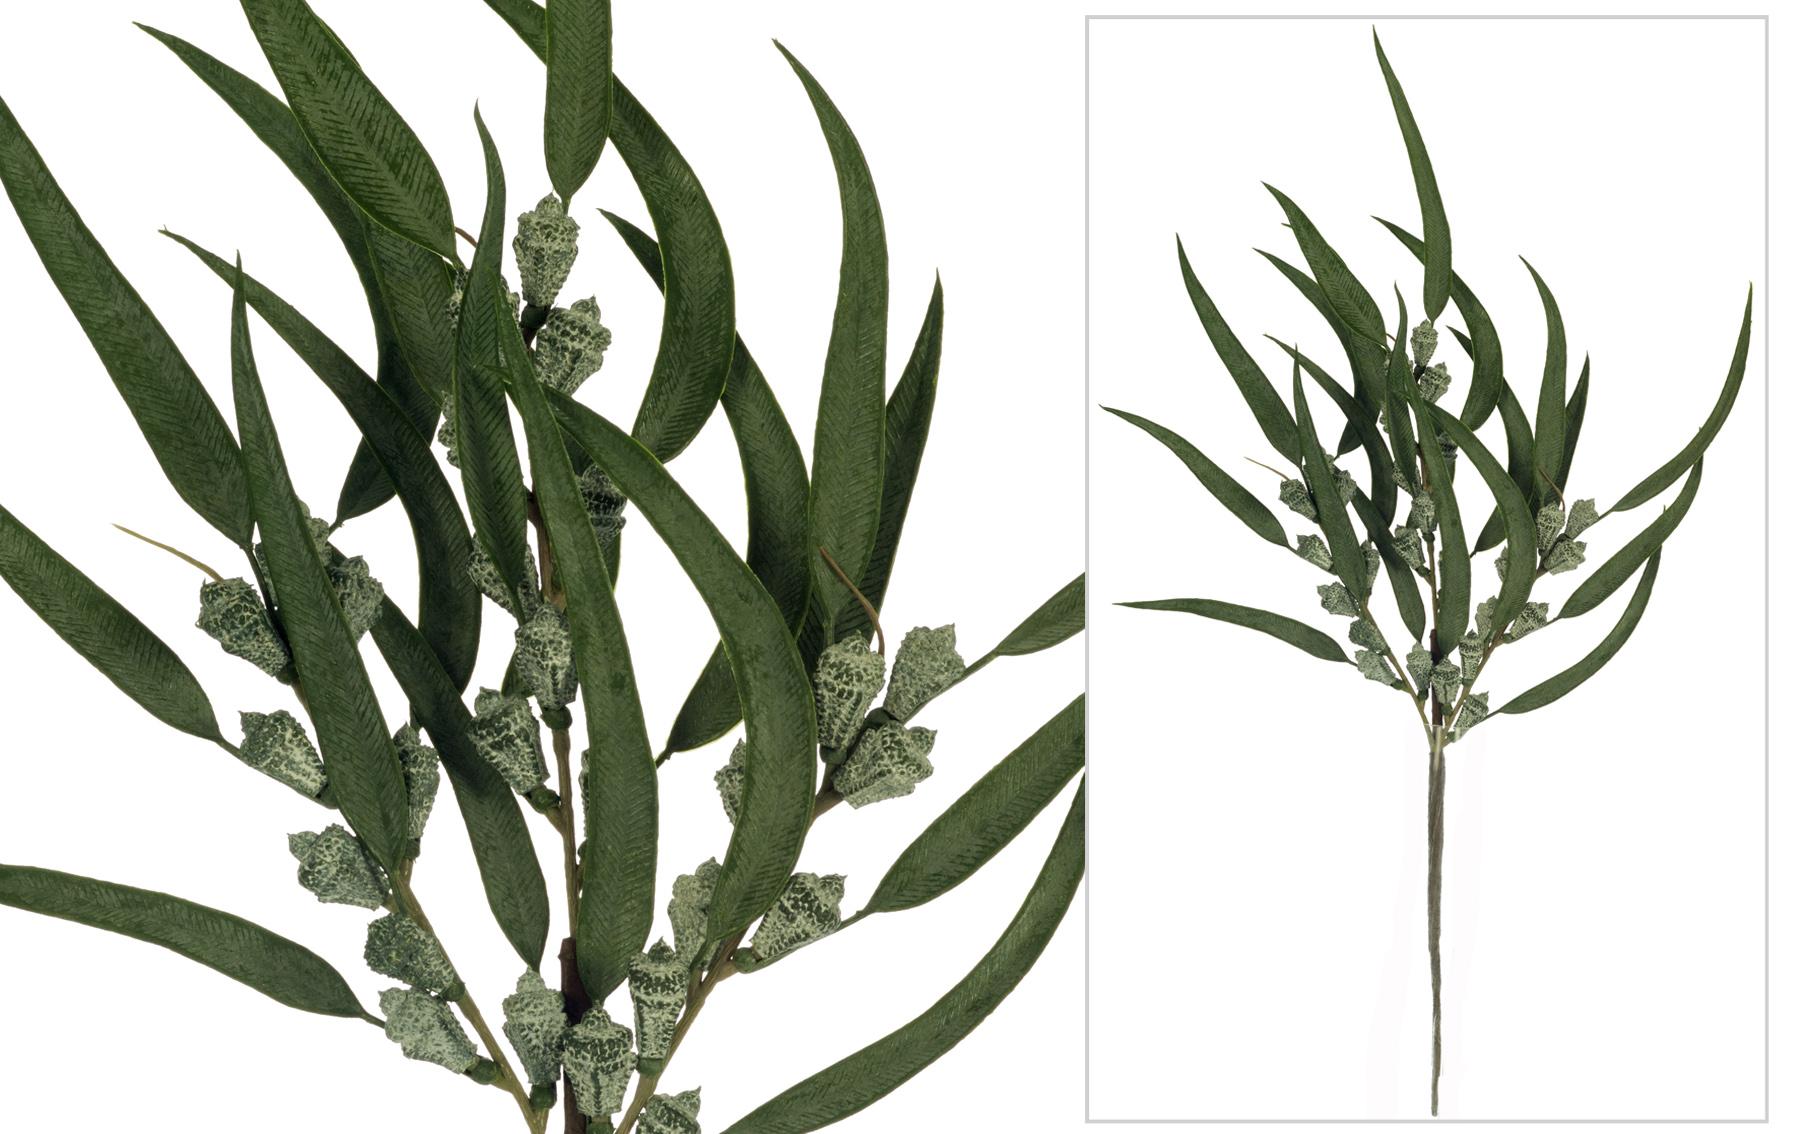 rama de eucalipto navidad www.floresymuchomas.com